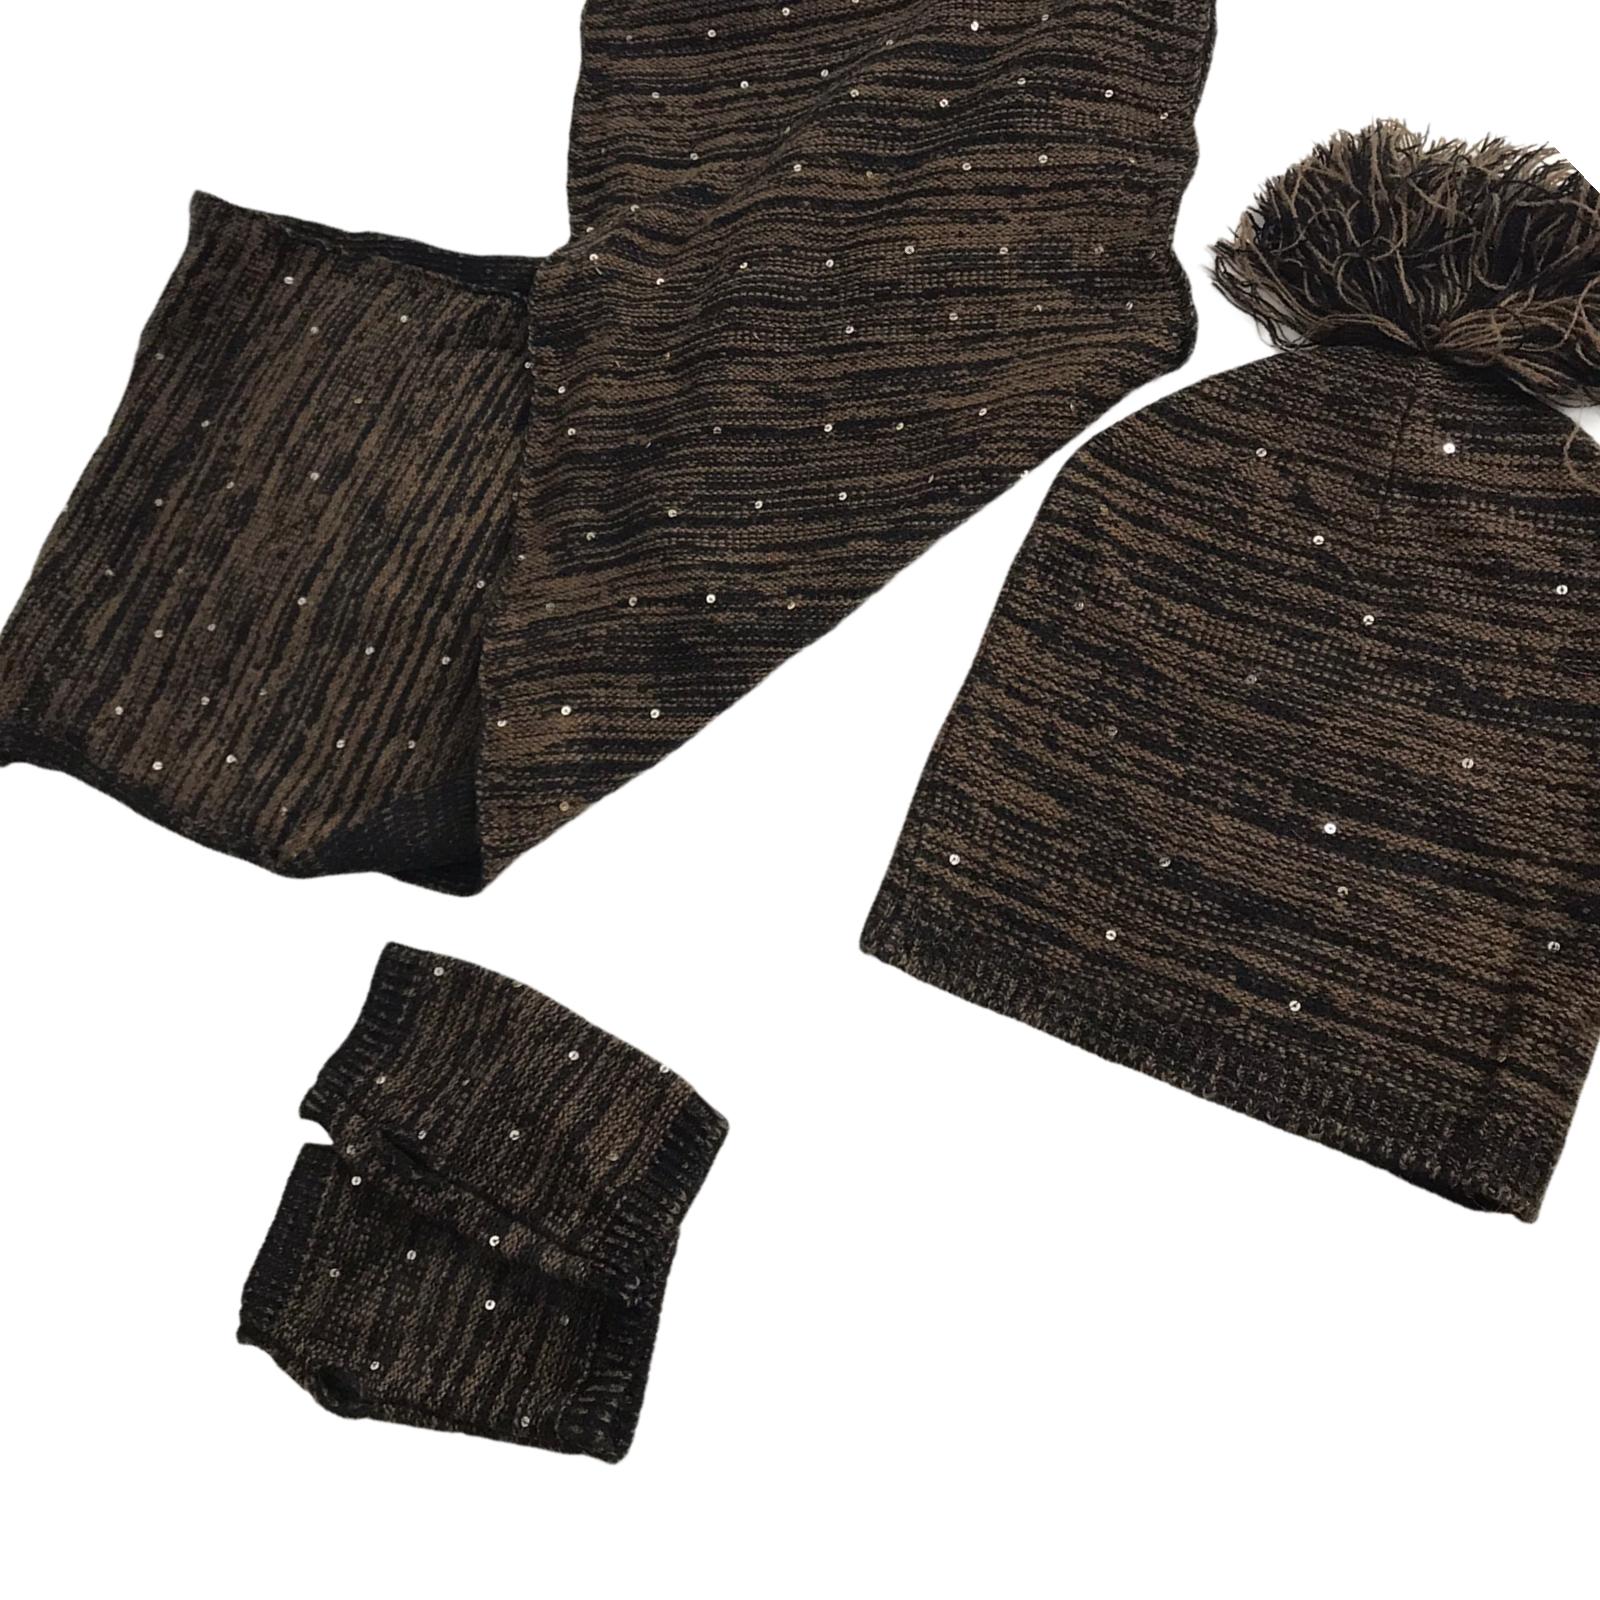 Brown Knit Sequin Hat, Scarf & Fingerless Glove Set